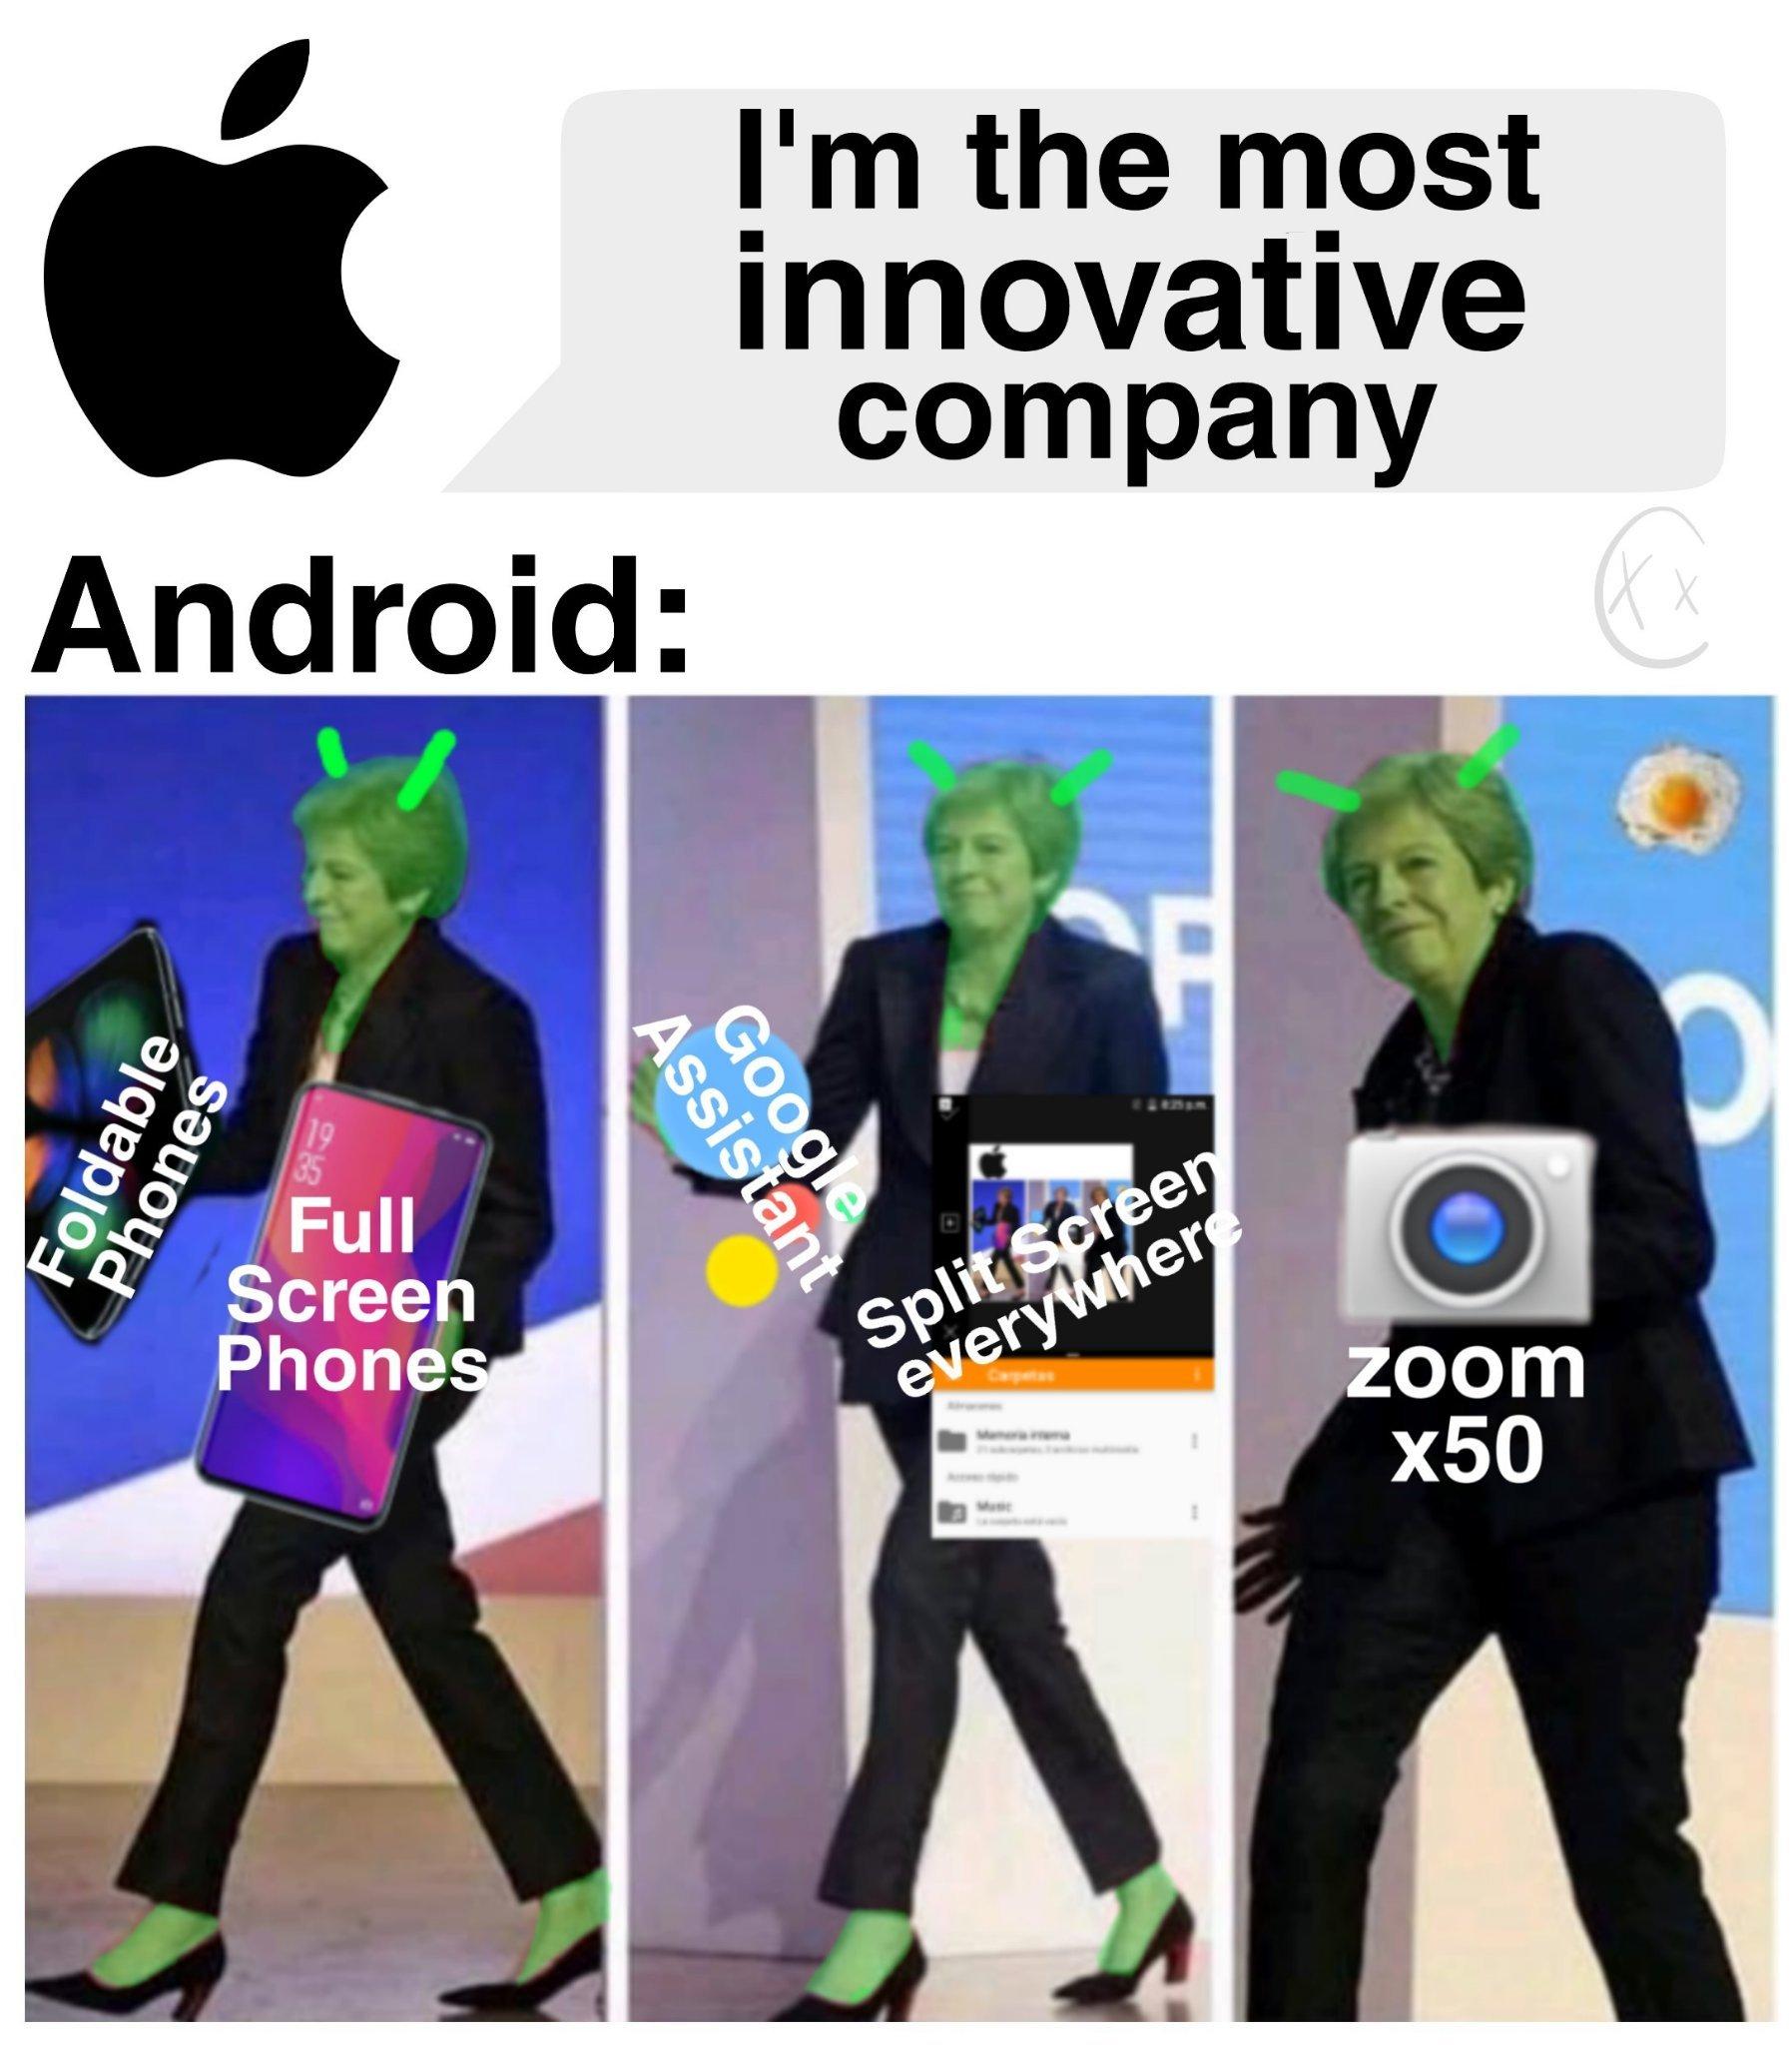 Apple was innovative - meme